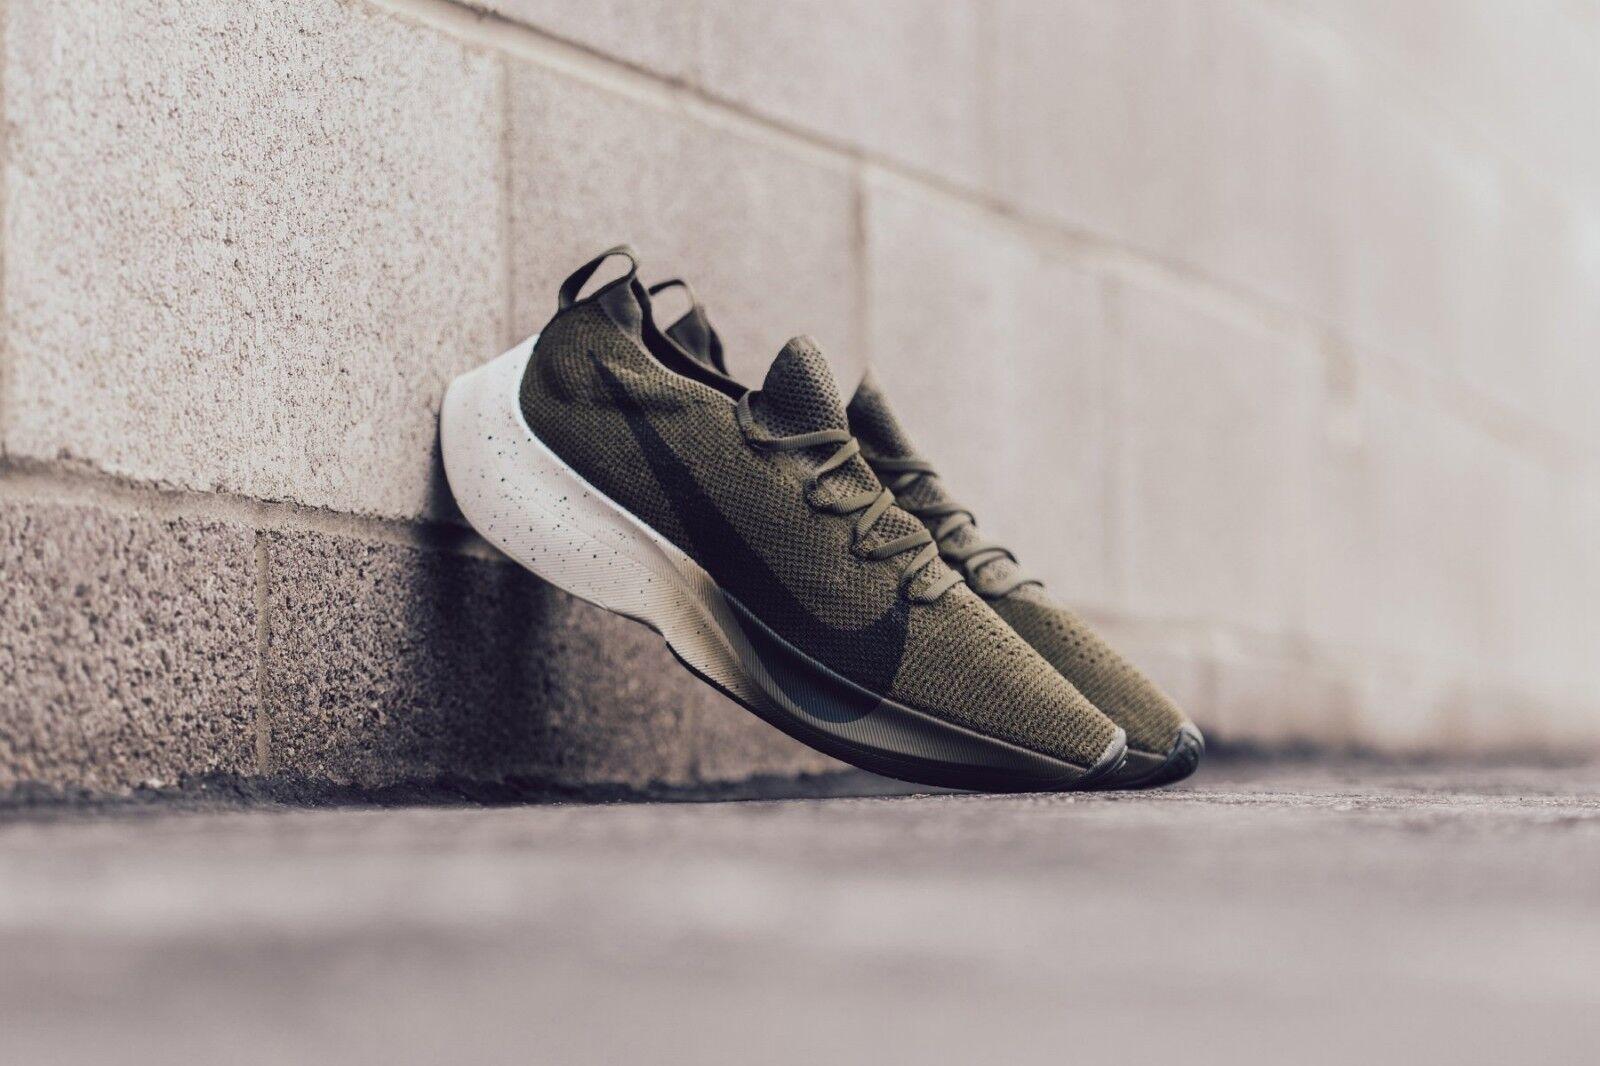 Nike vapore street flyknit medio olive / sequoia uomo - 13 - aq1763 201